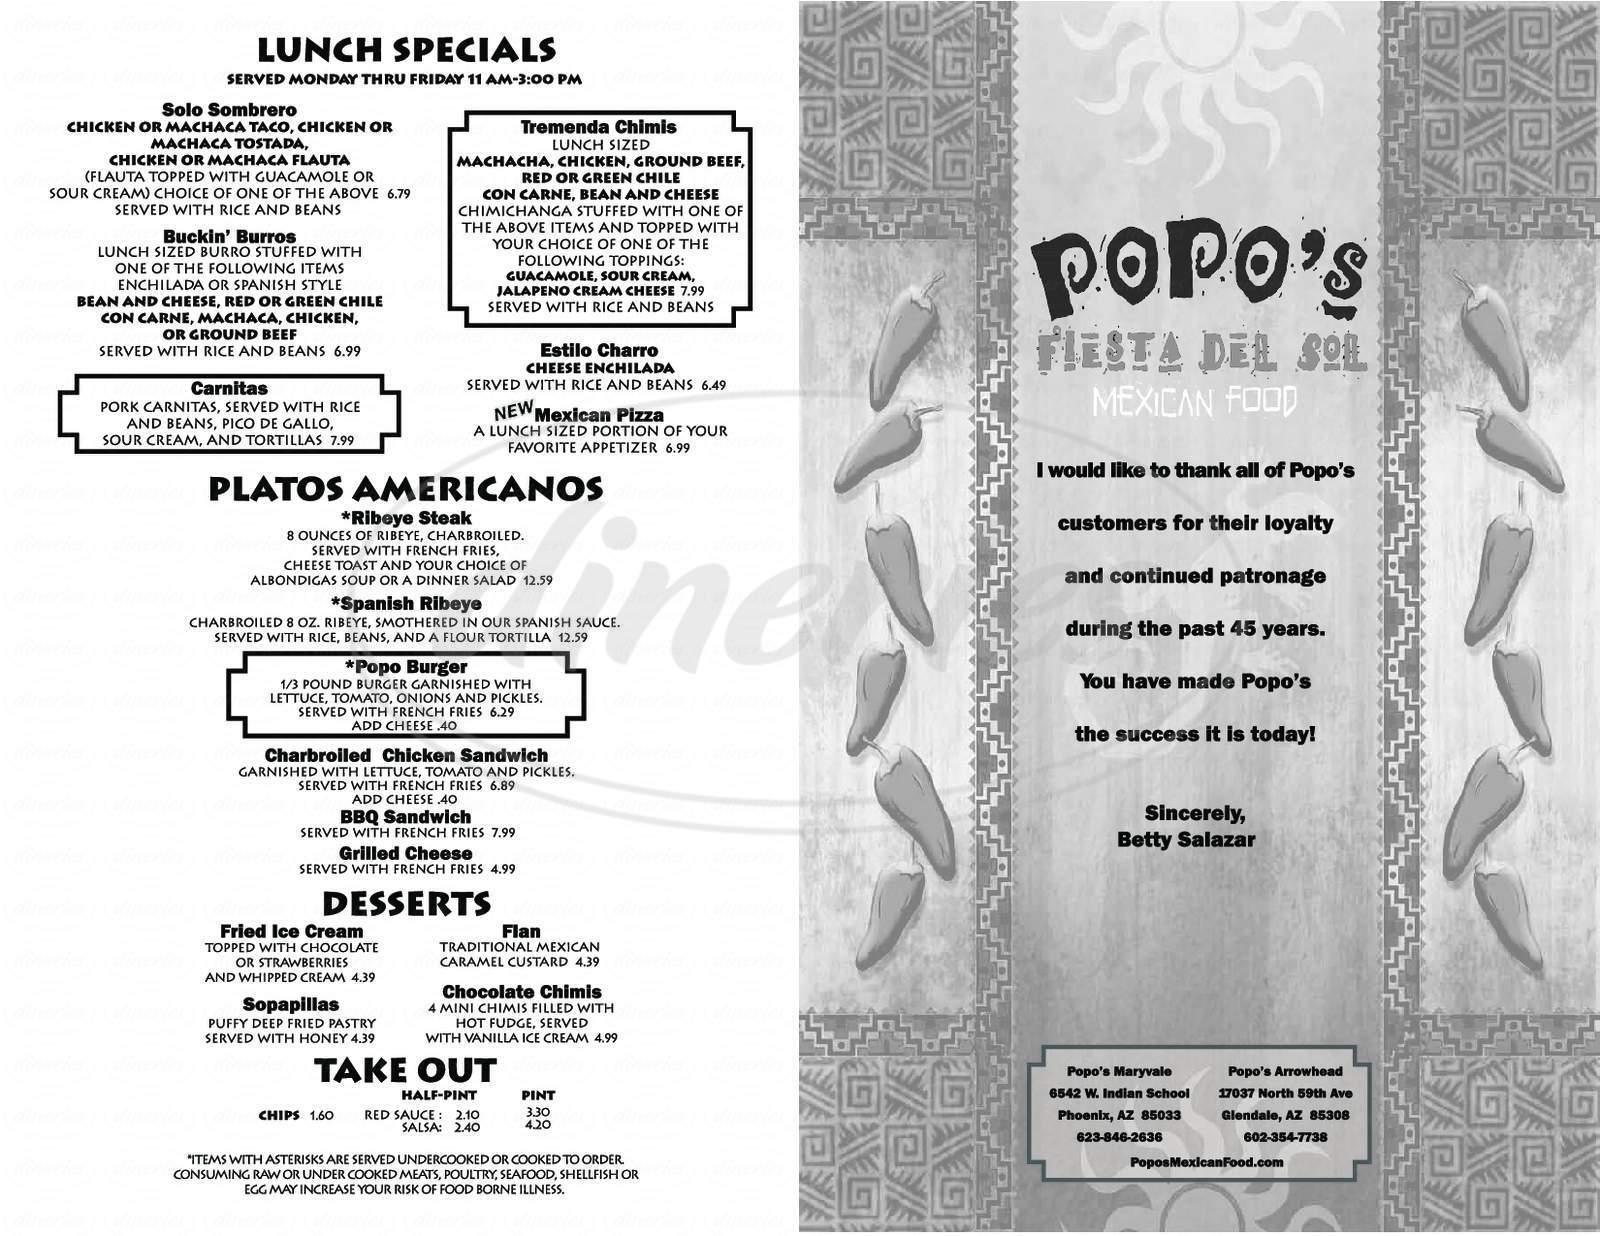 menu for Popo's Fiesta Del Sol Mexican Food